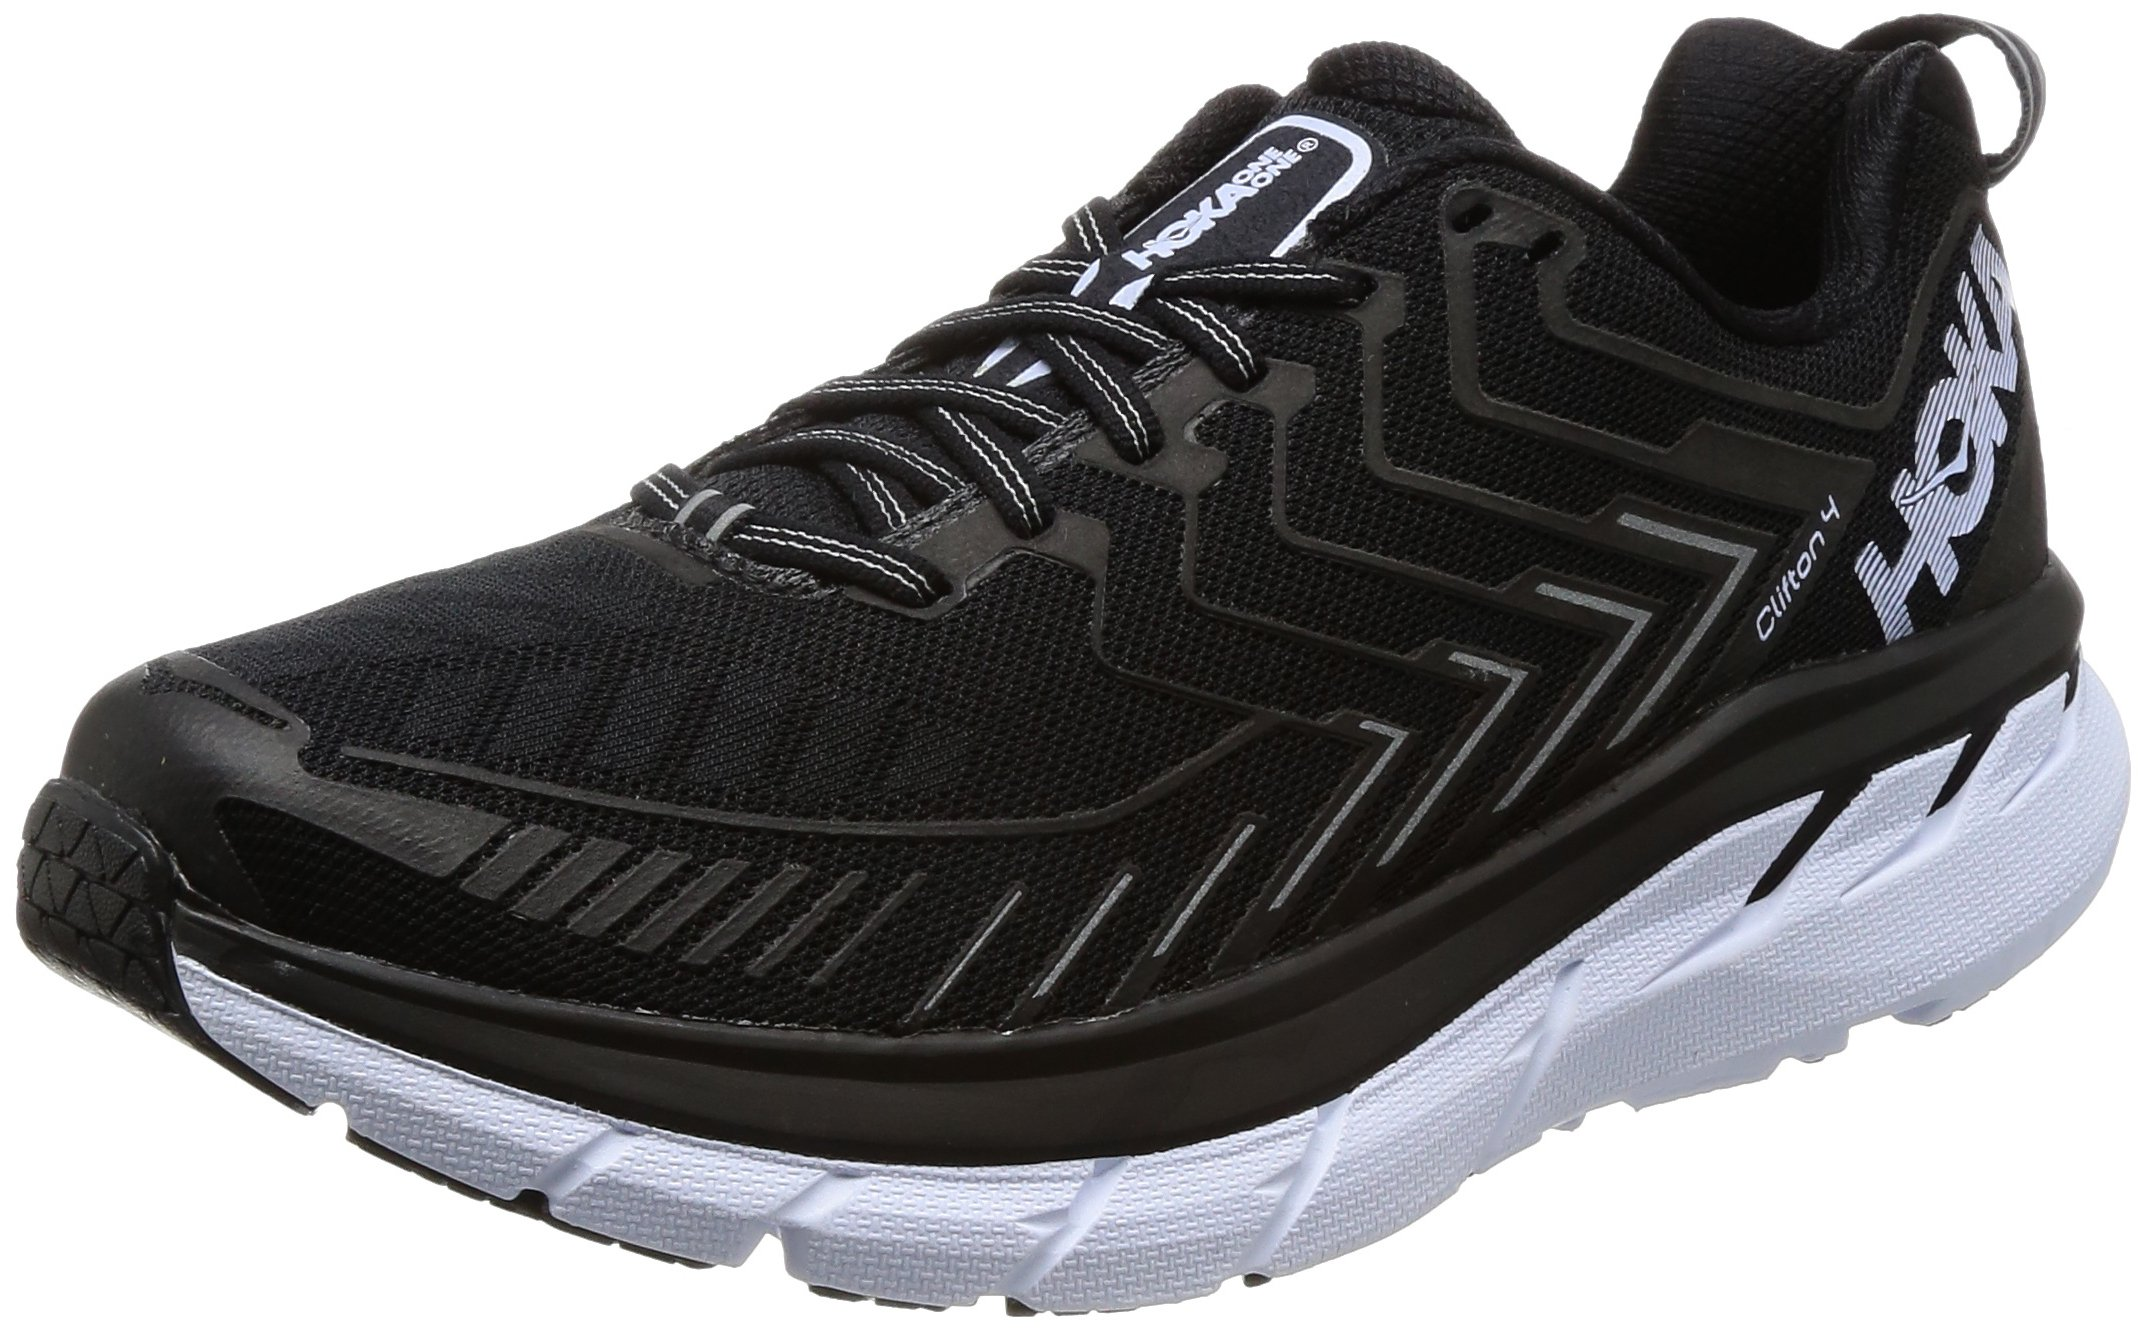 HOKA ONE ONE Clifton 4 Shoes Running Shoes - Men's Black/White 8